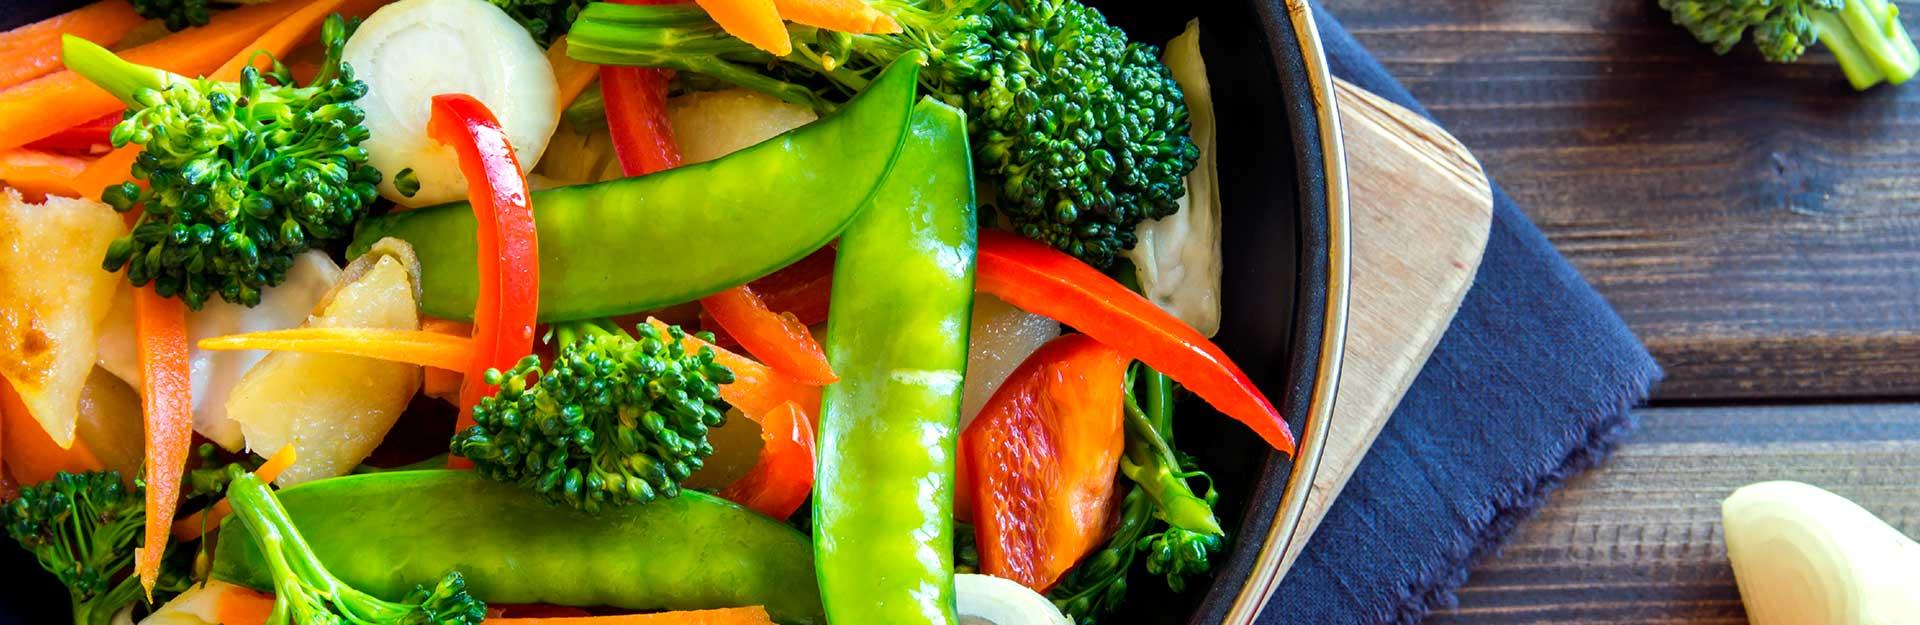 A vegetable stir fry